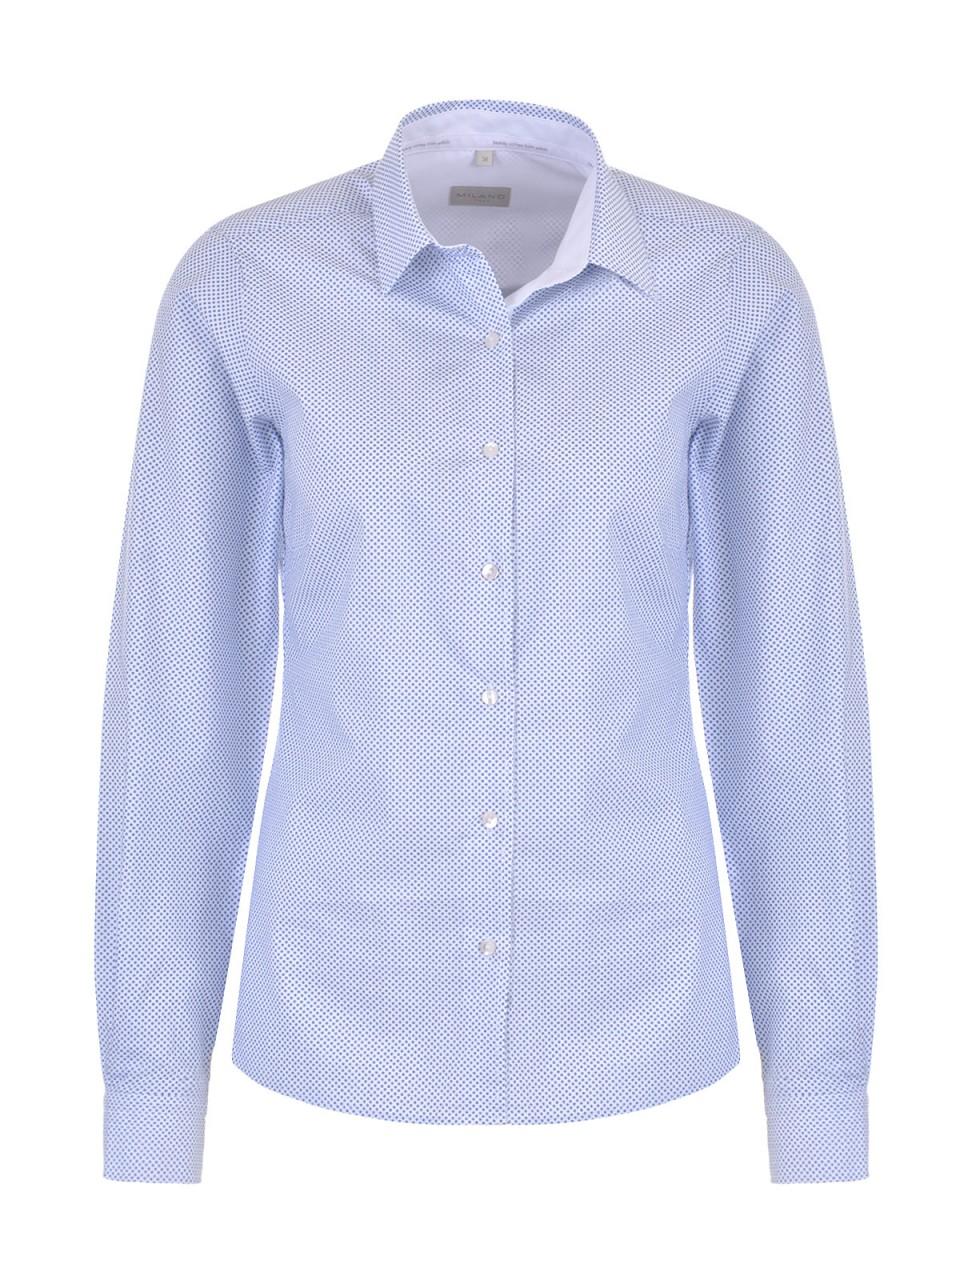 milano-italy-damen-bluse-wei-szlig-blau